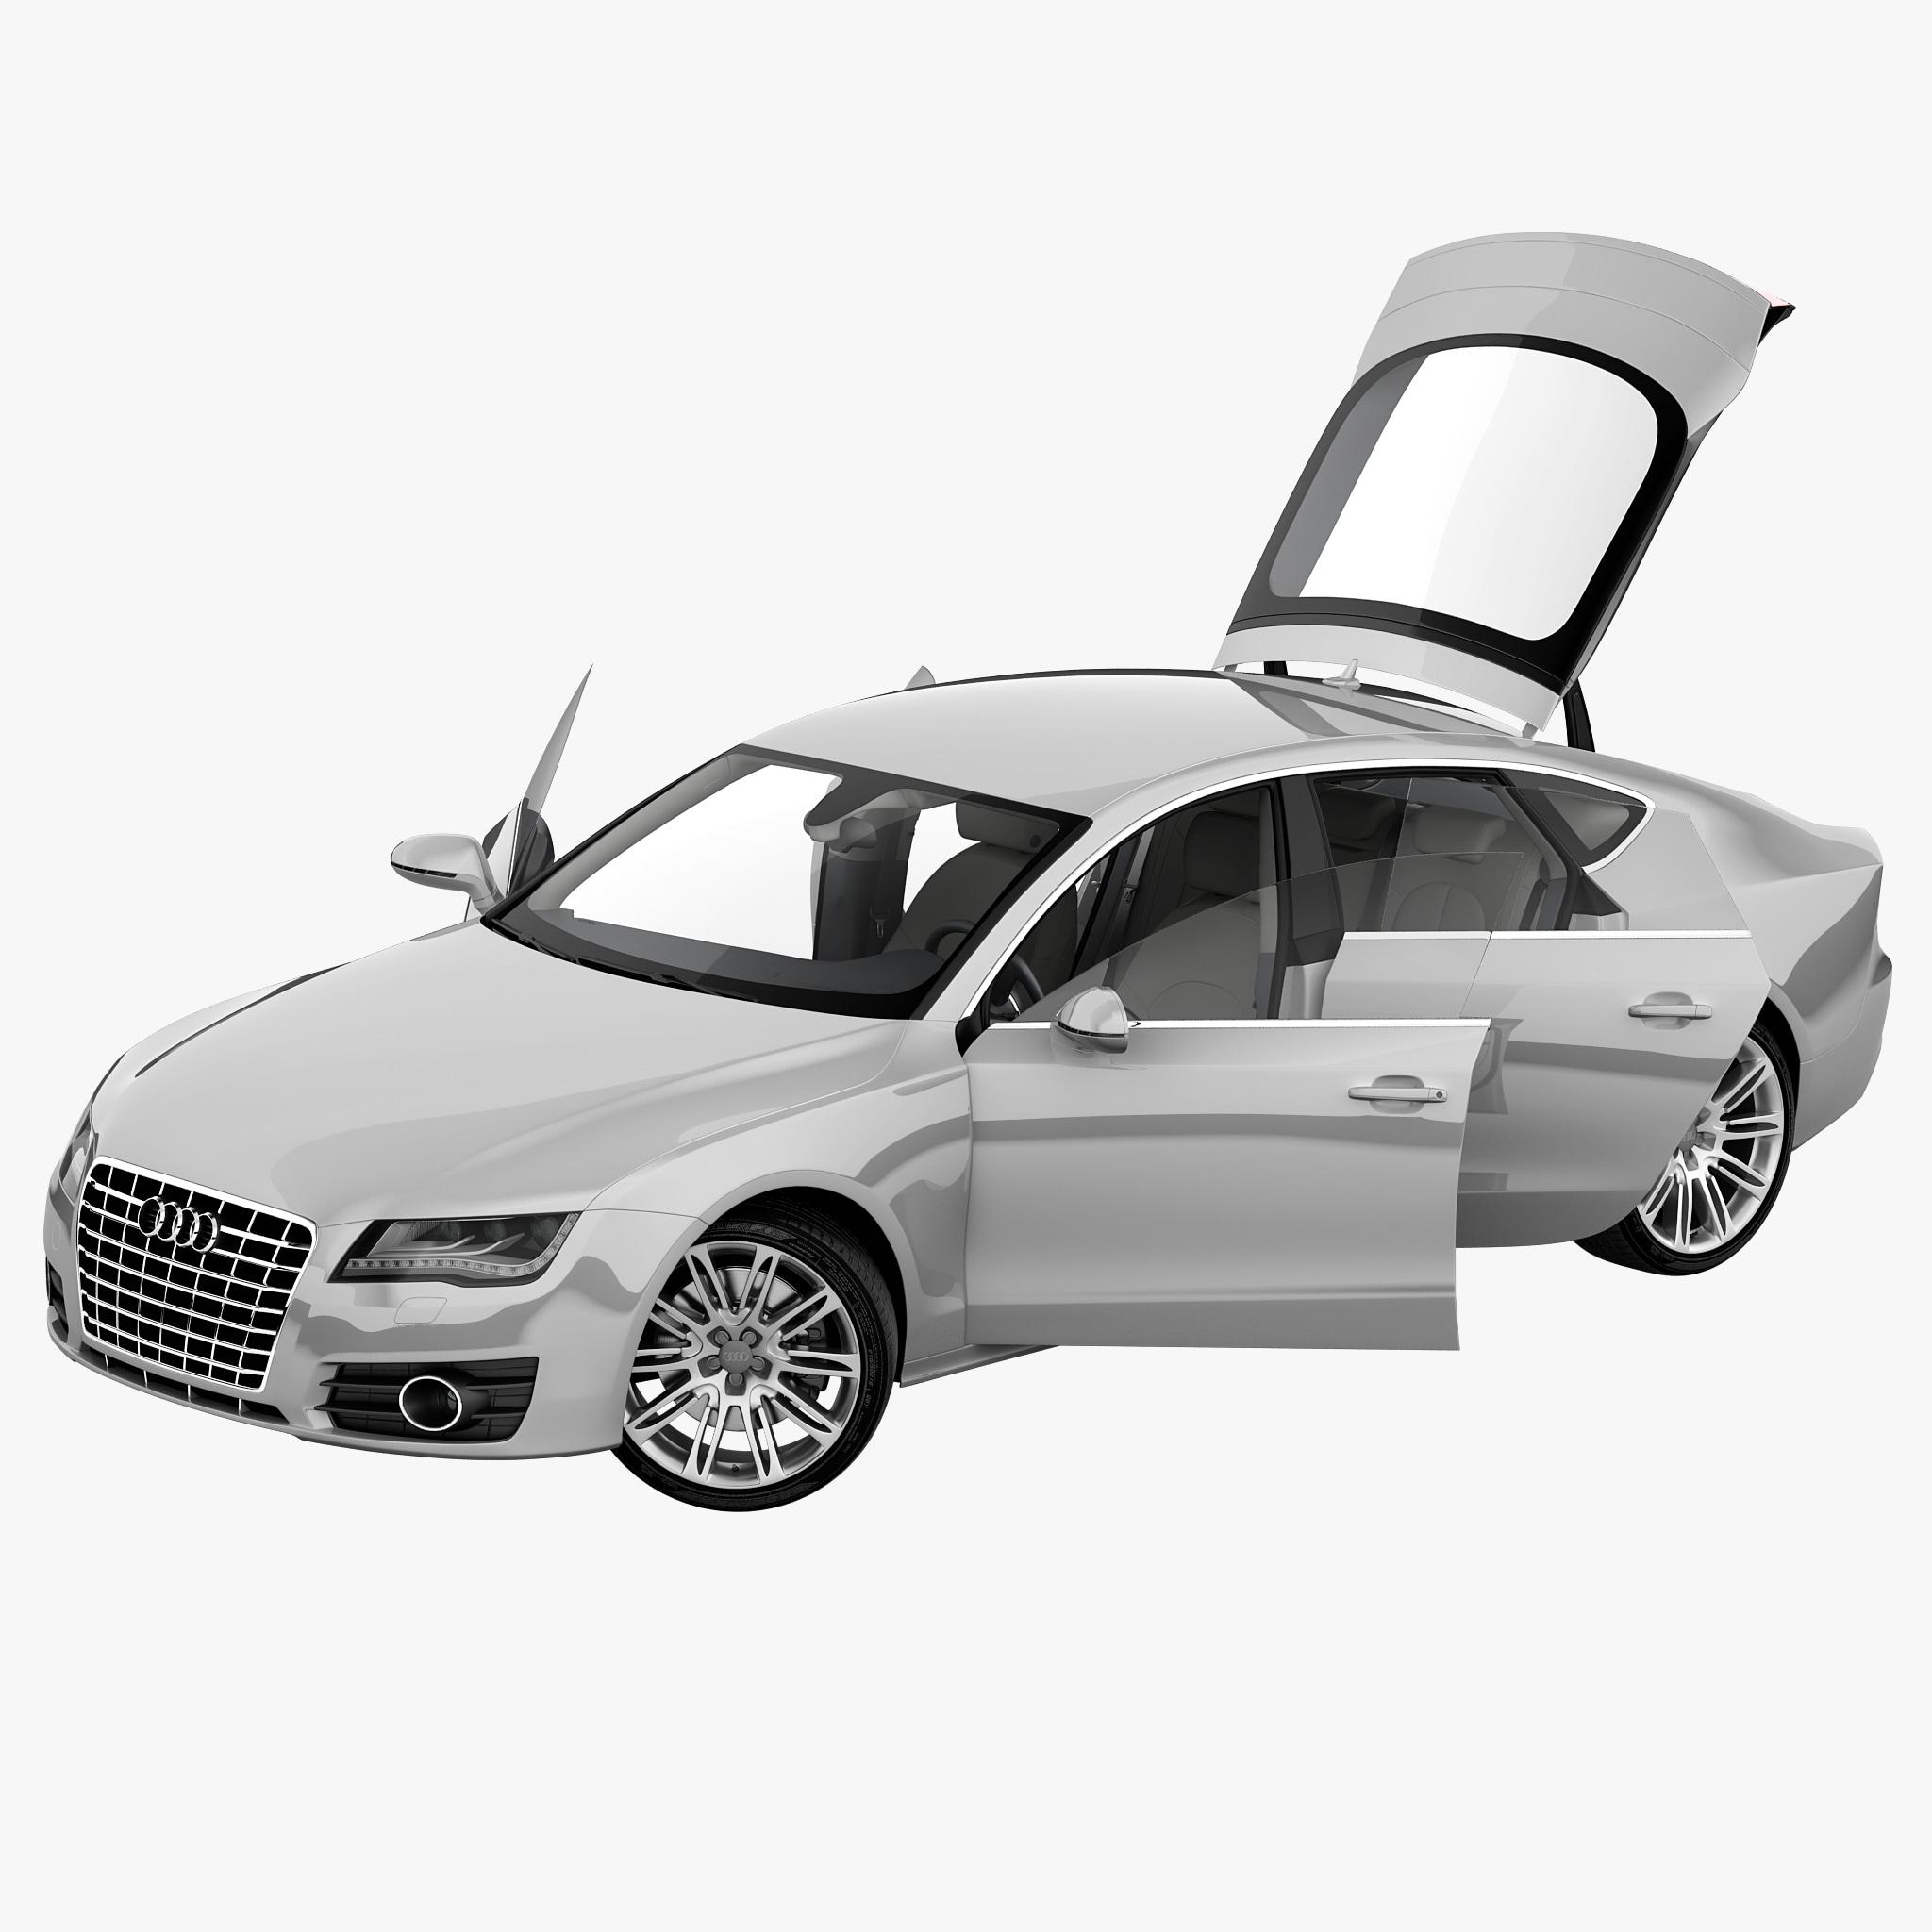 Audi A7 2013 Rigged_1.jpg